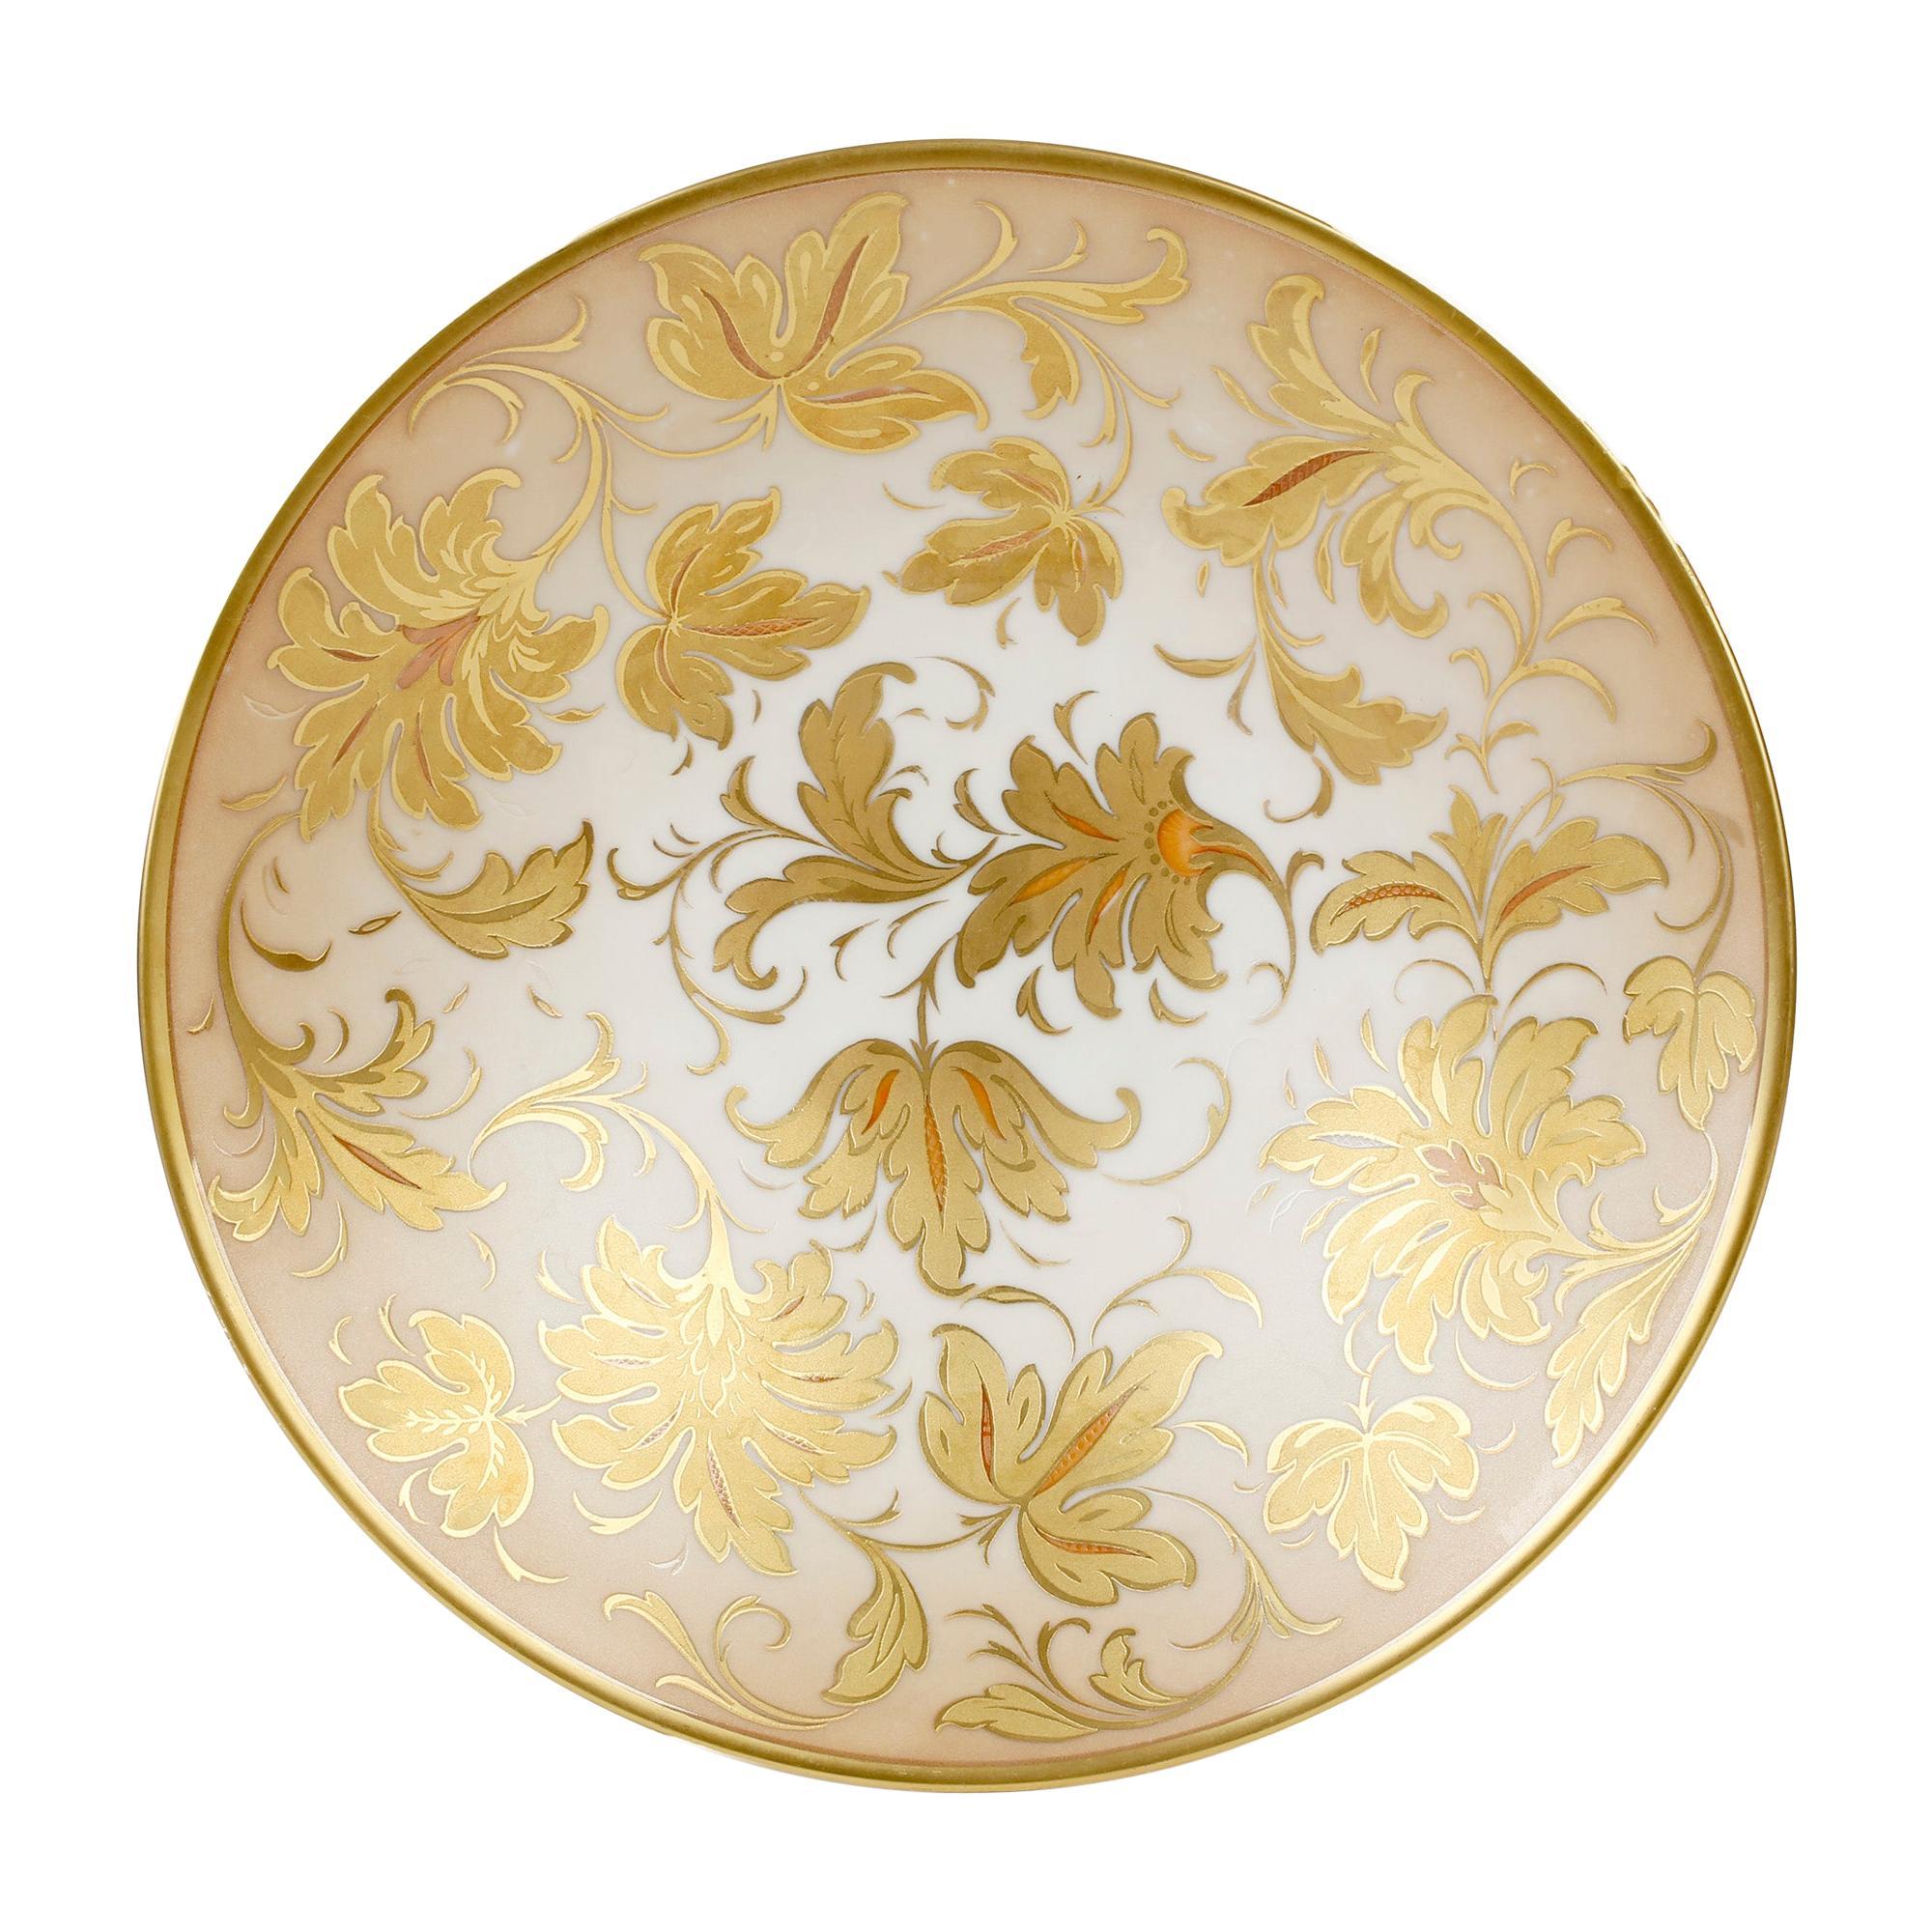 Arrigo Finzi Italian Mid Century Oro Zecchino Leaf Design Porcelain Bowl